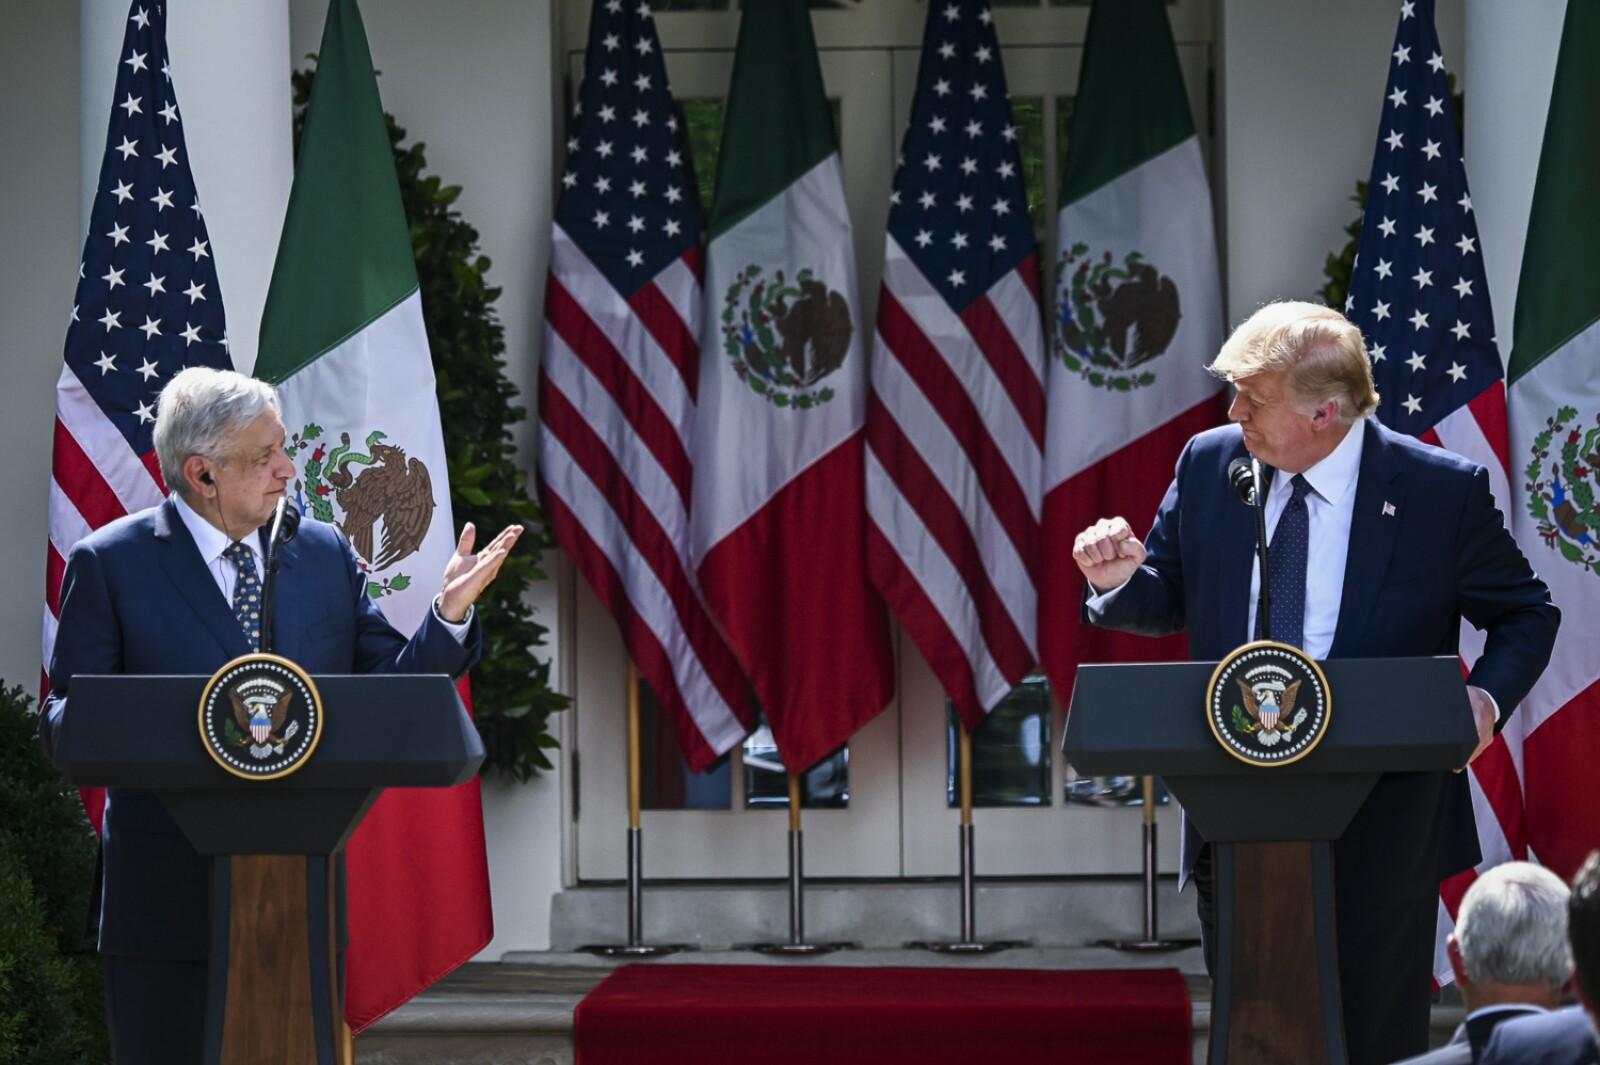 Trump hosts talks with Mexican counterpart Lopez Obrador